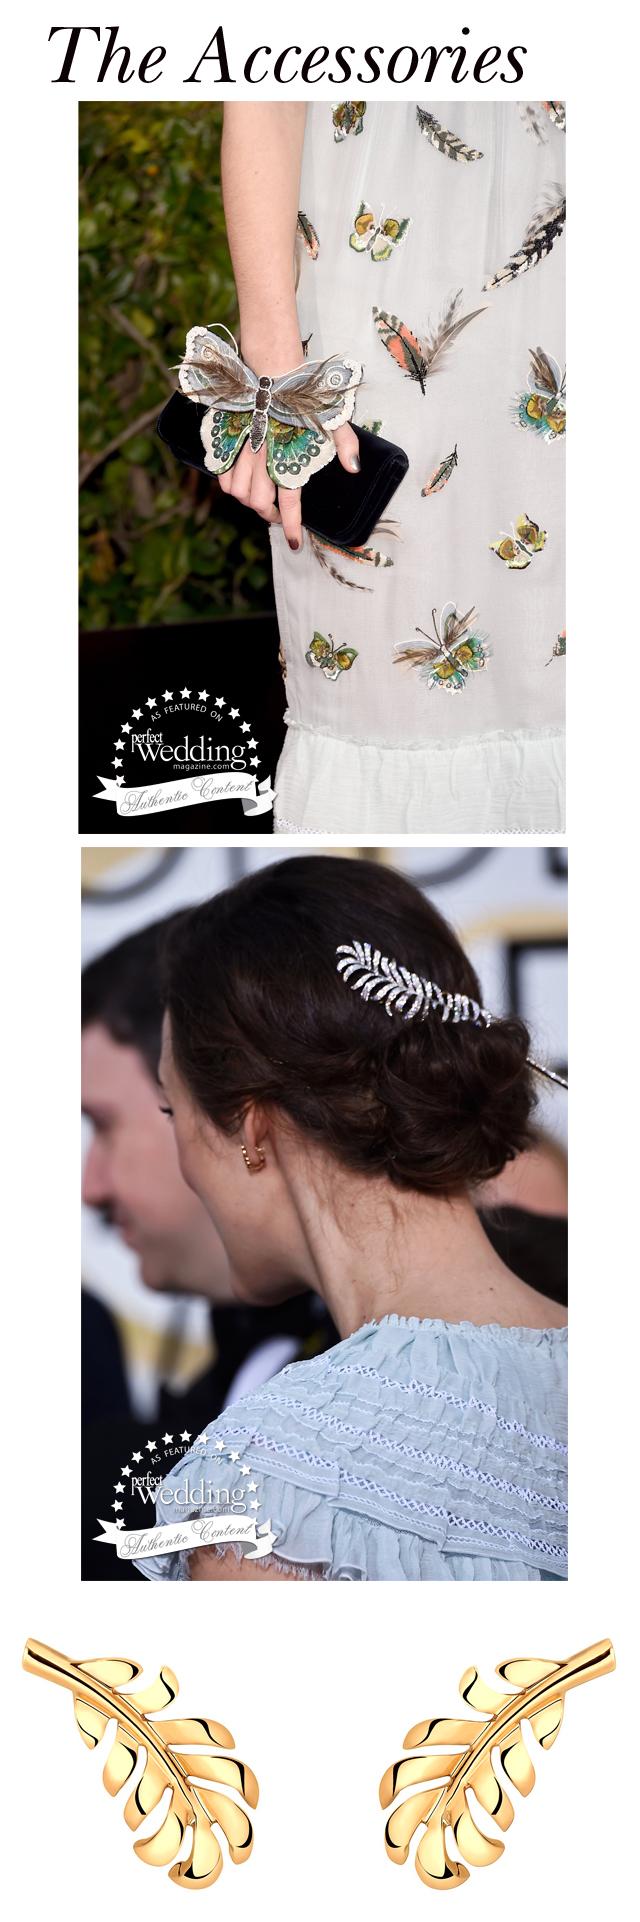 Keira Knightley, Chanel, Chanel Beauty, Perfect Wedding Magazine, Chanel Wedding Inspiration